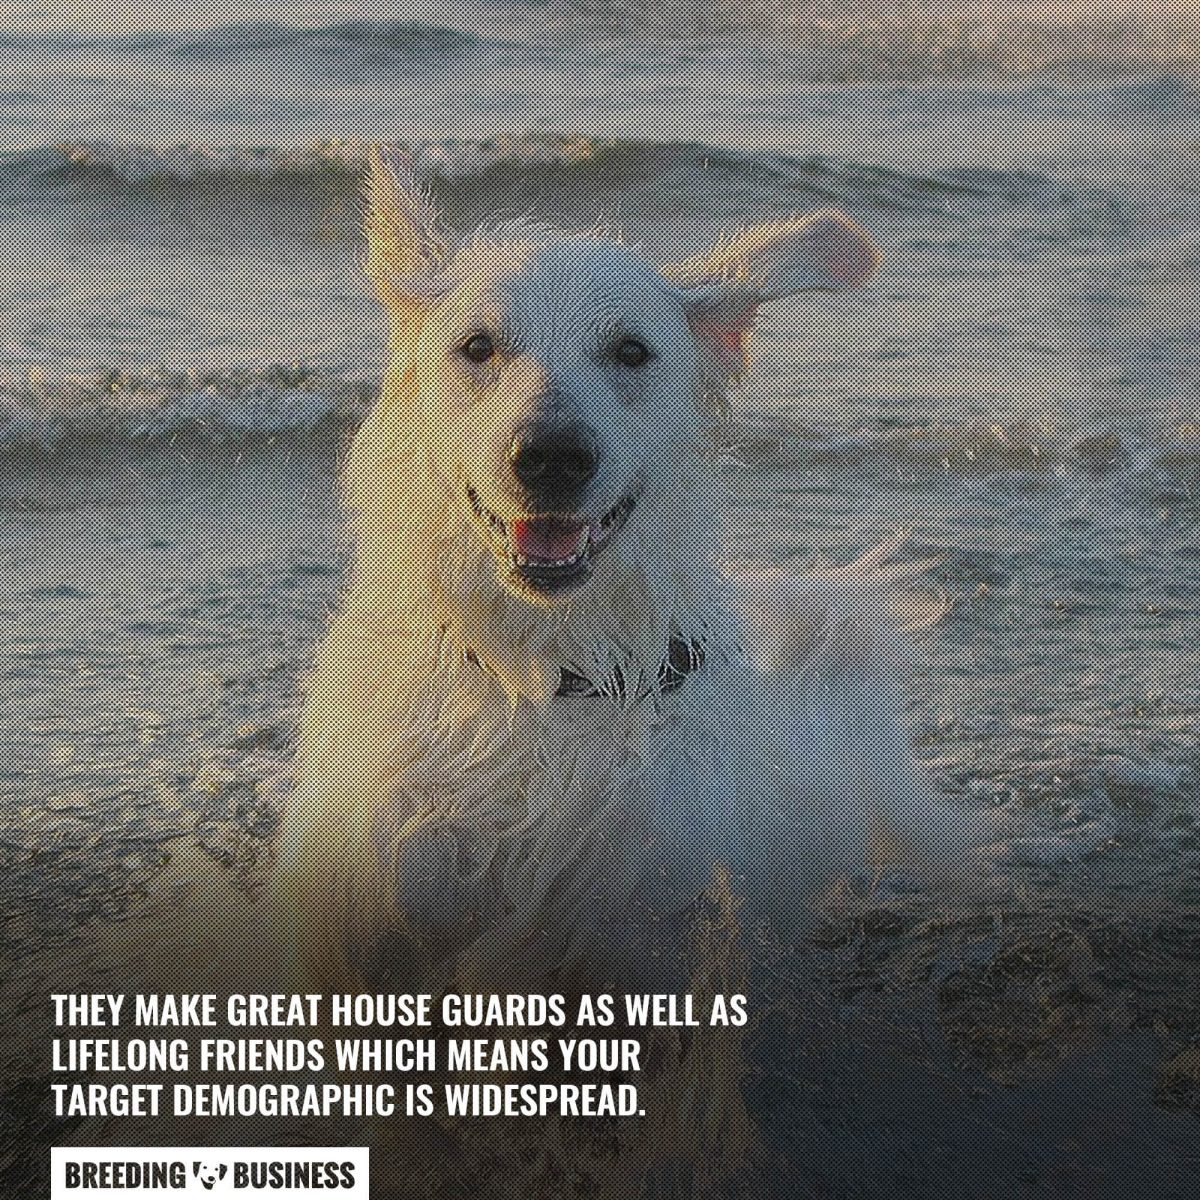 breeding kuvasz dogs